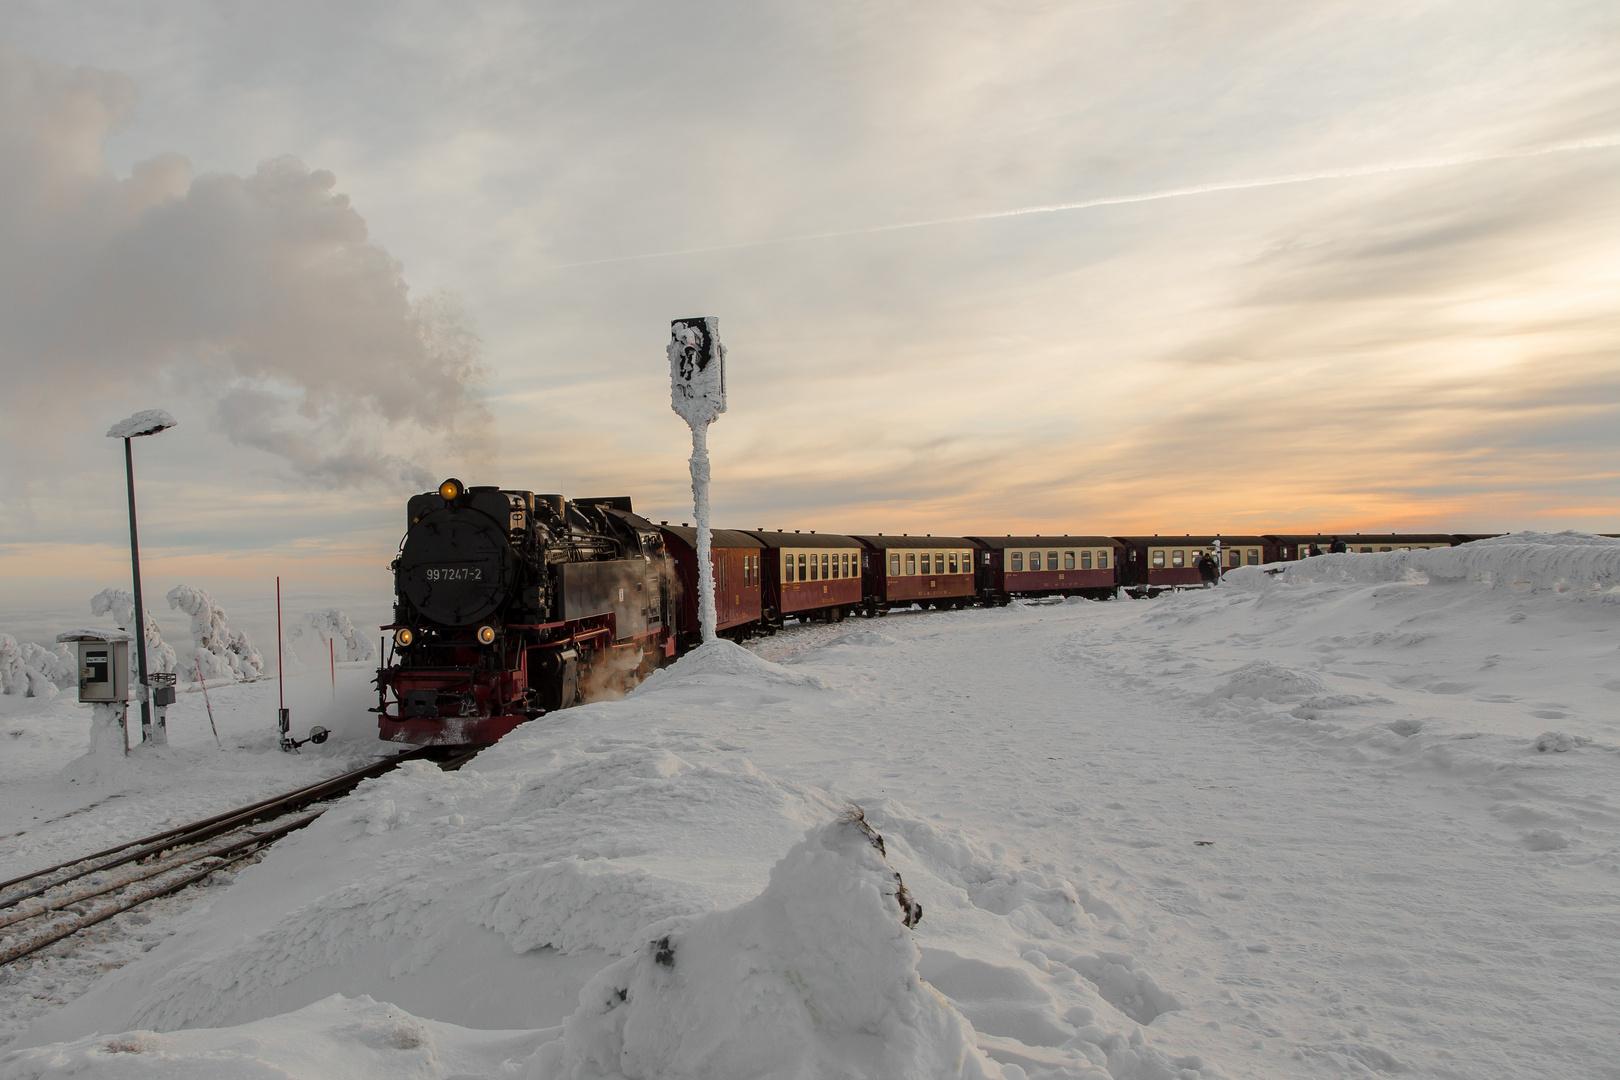 Brockenbahn, Ankunft am Gipfel